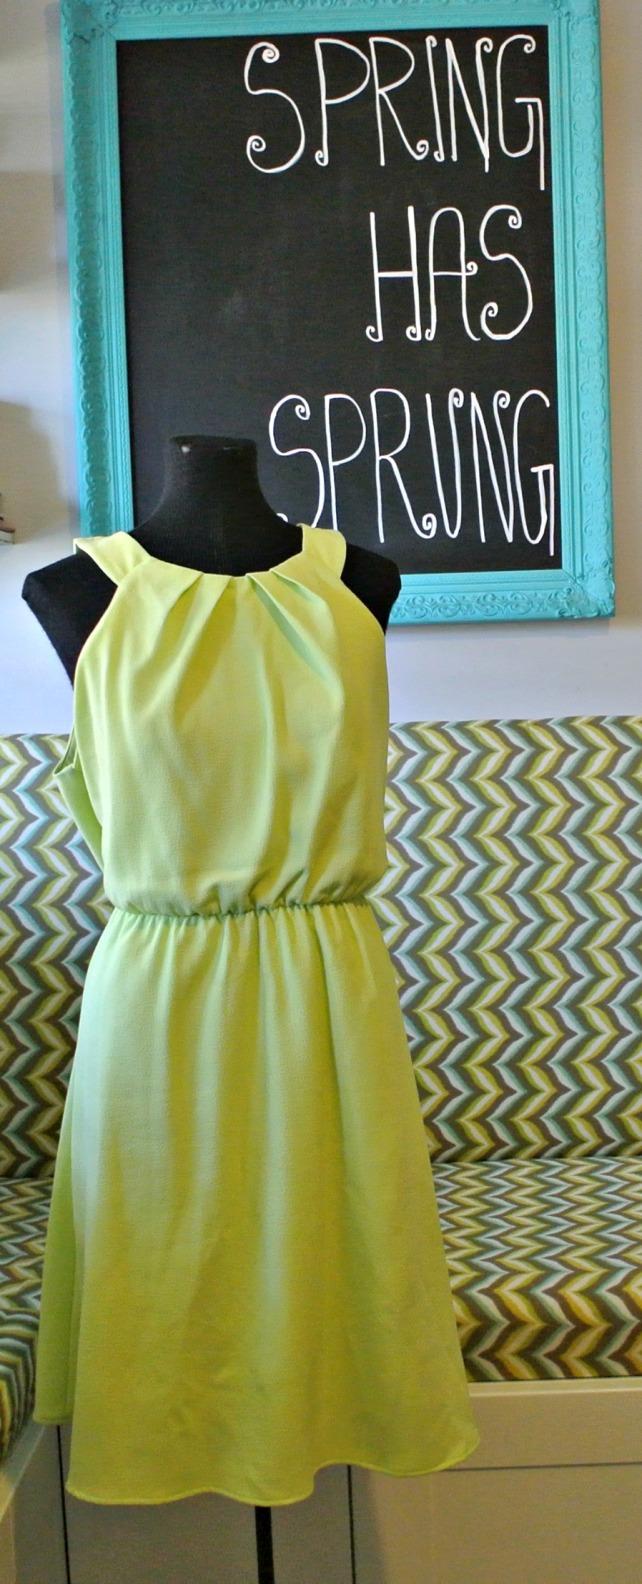 neon dress 2